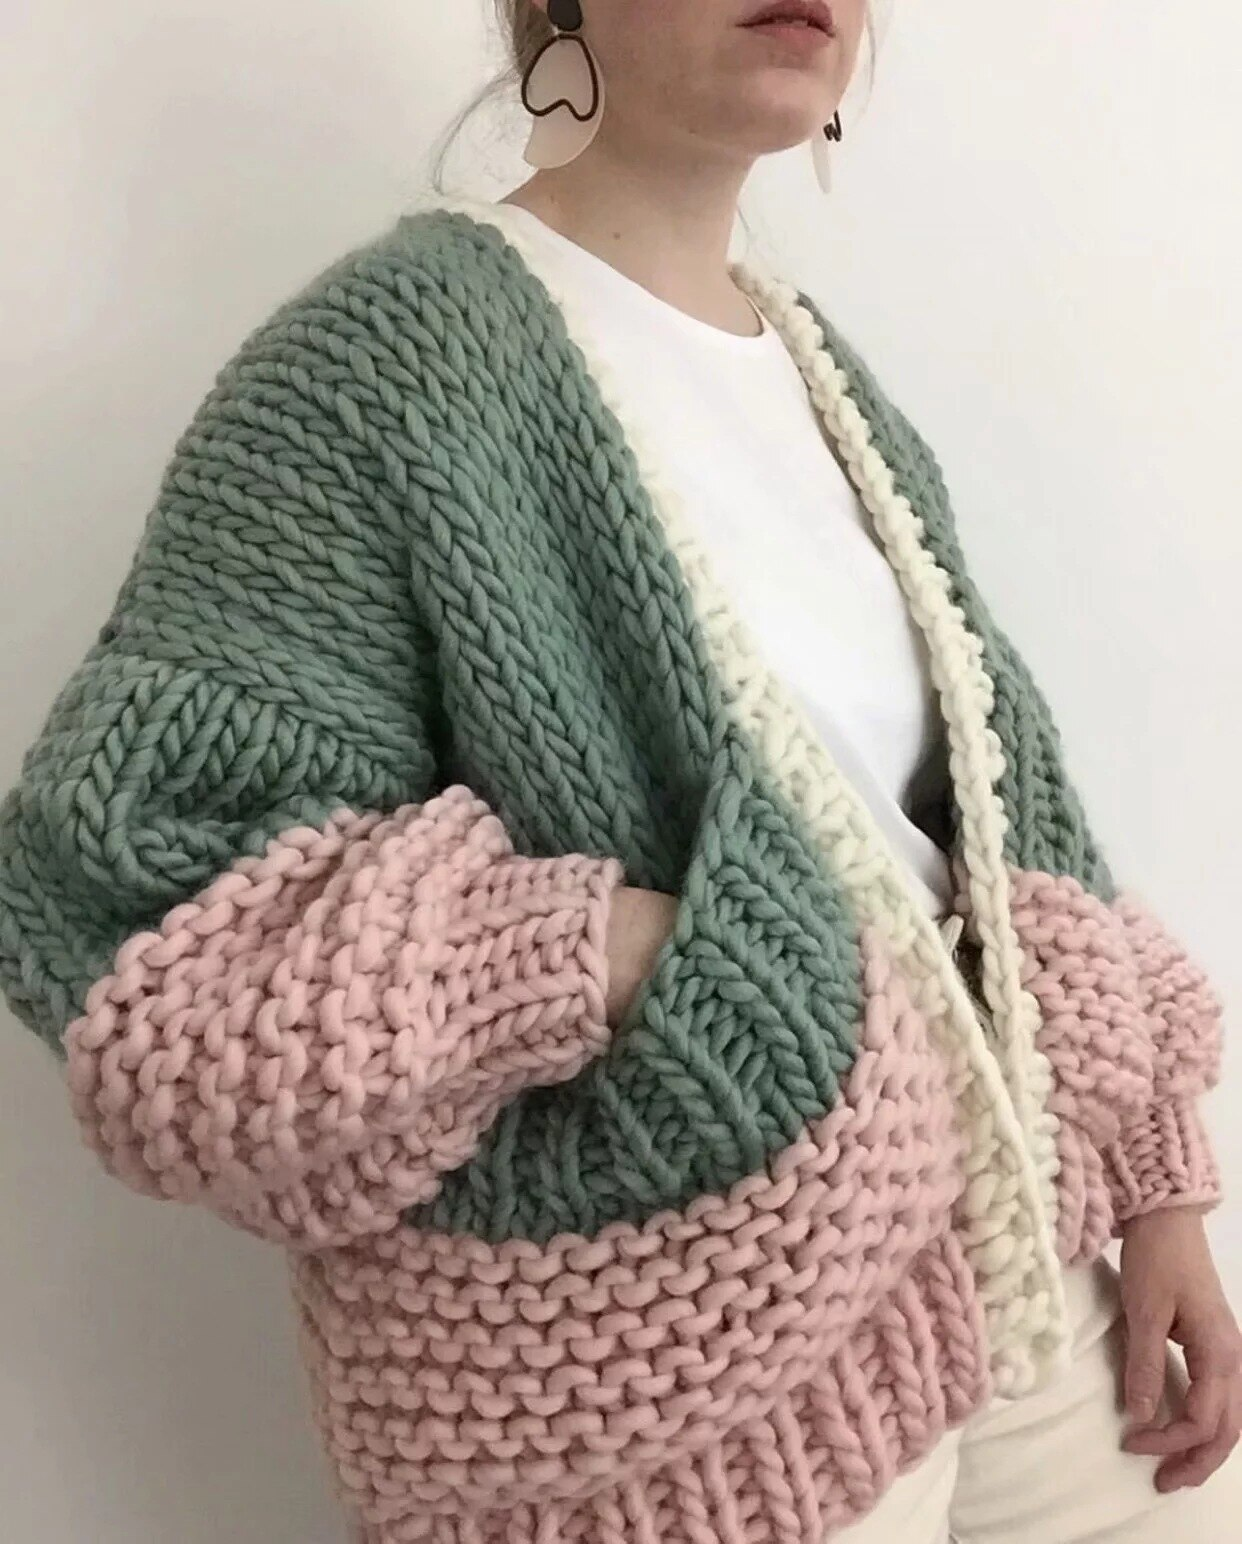 Handmade cardigan puff sleeve plus size cardigan women warm winter cardigans sweaters new fashion knitwear outwear enlarge